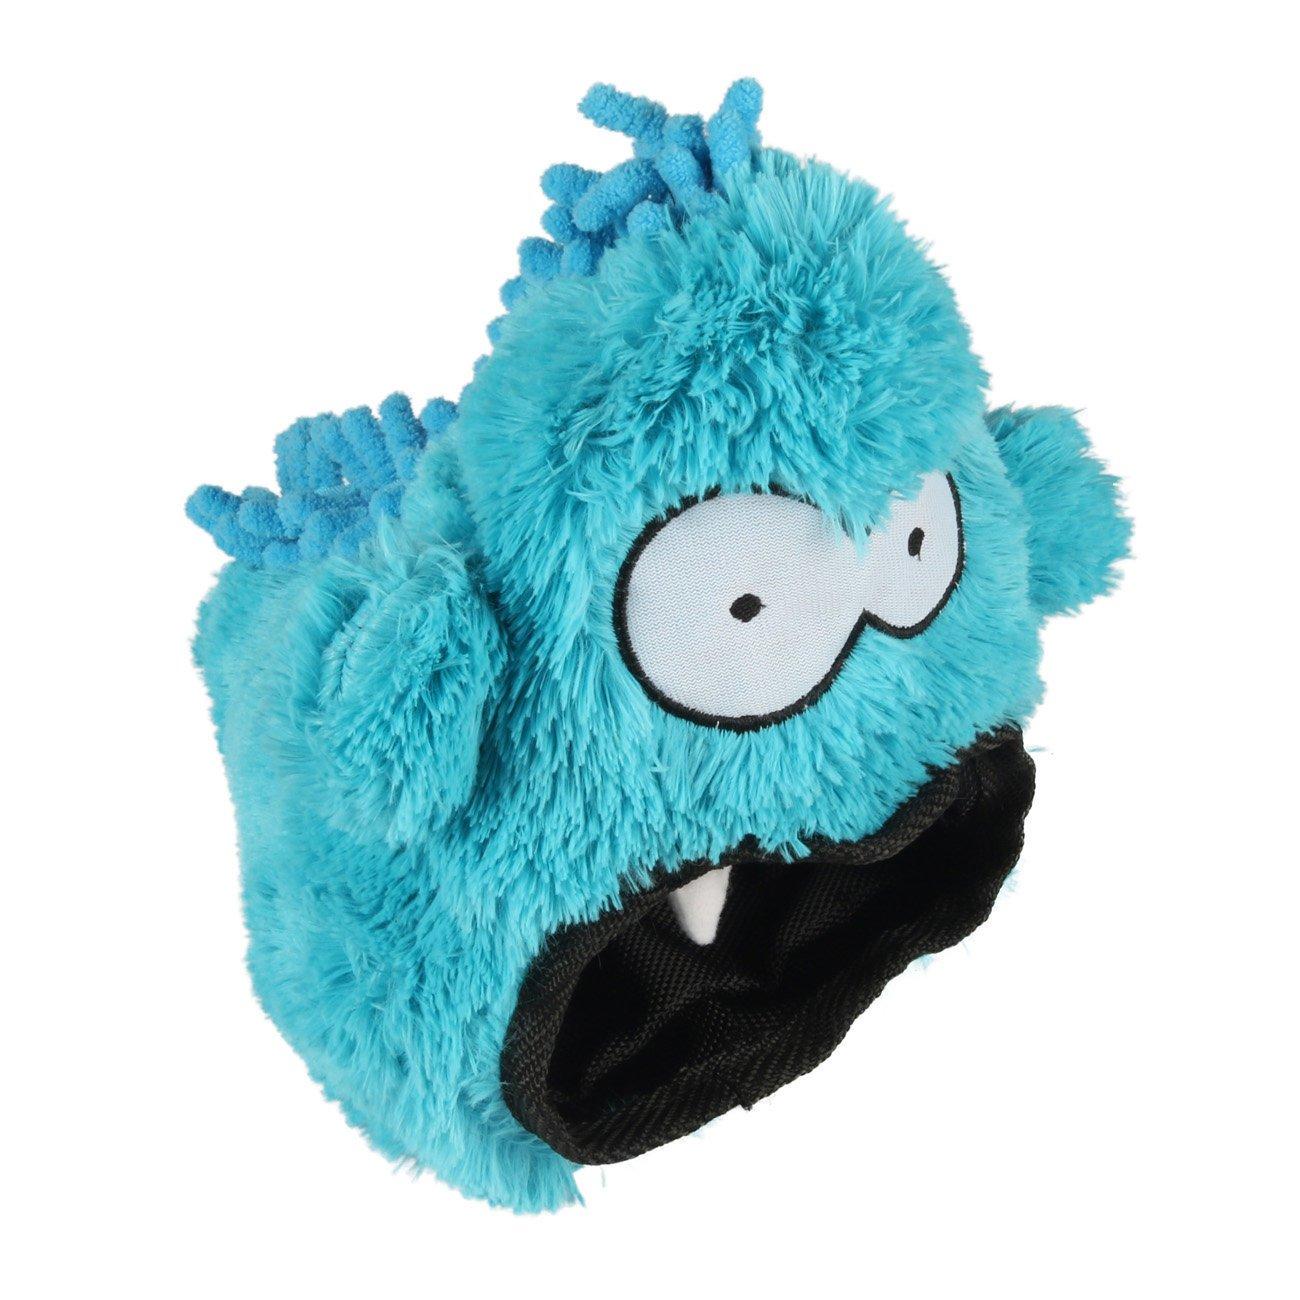 Coockoo Plüsch Monster Hundespielzeug, Bild 7